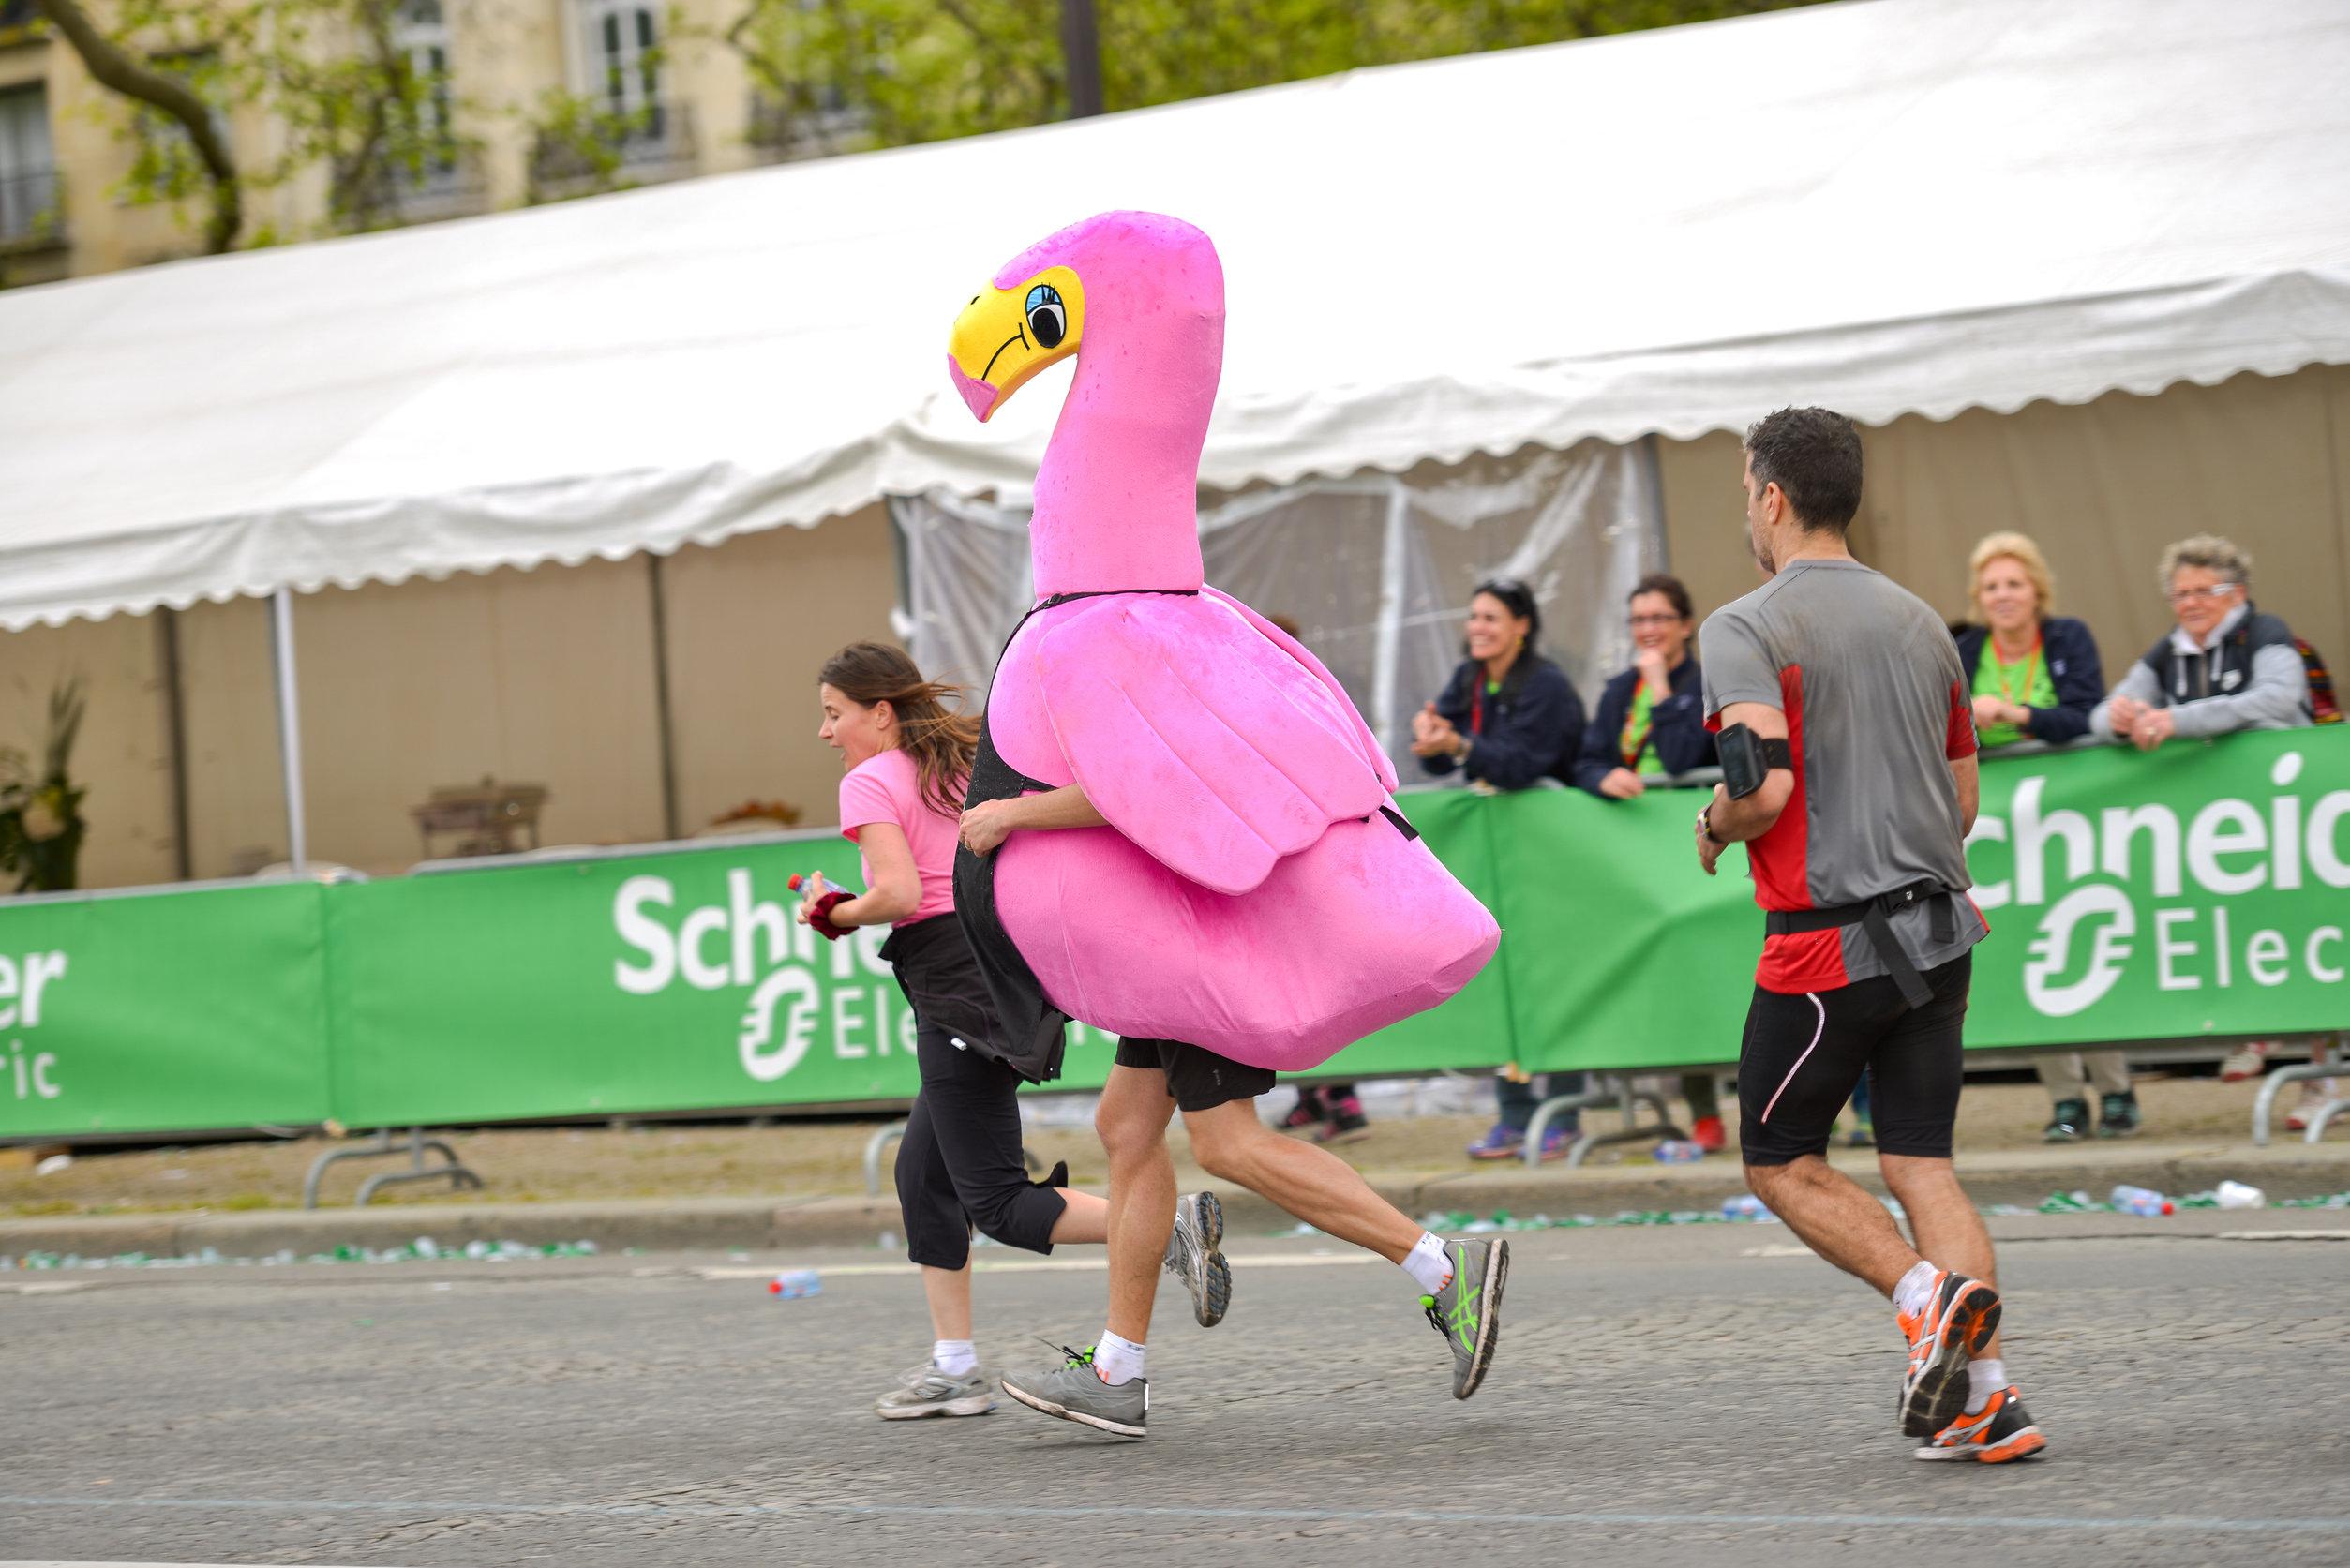 Our guide to getting through Art Basel Marathon